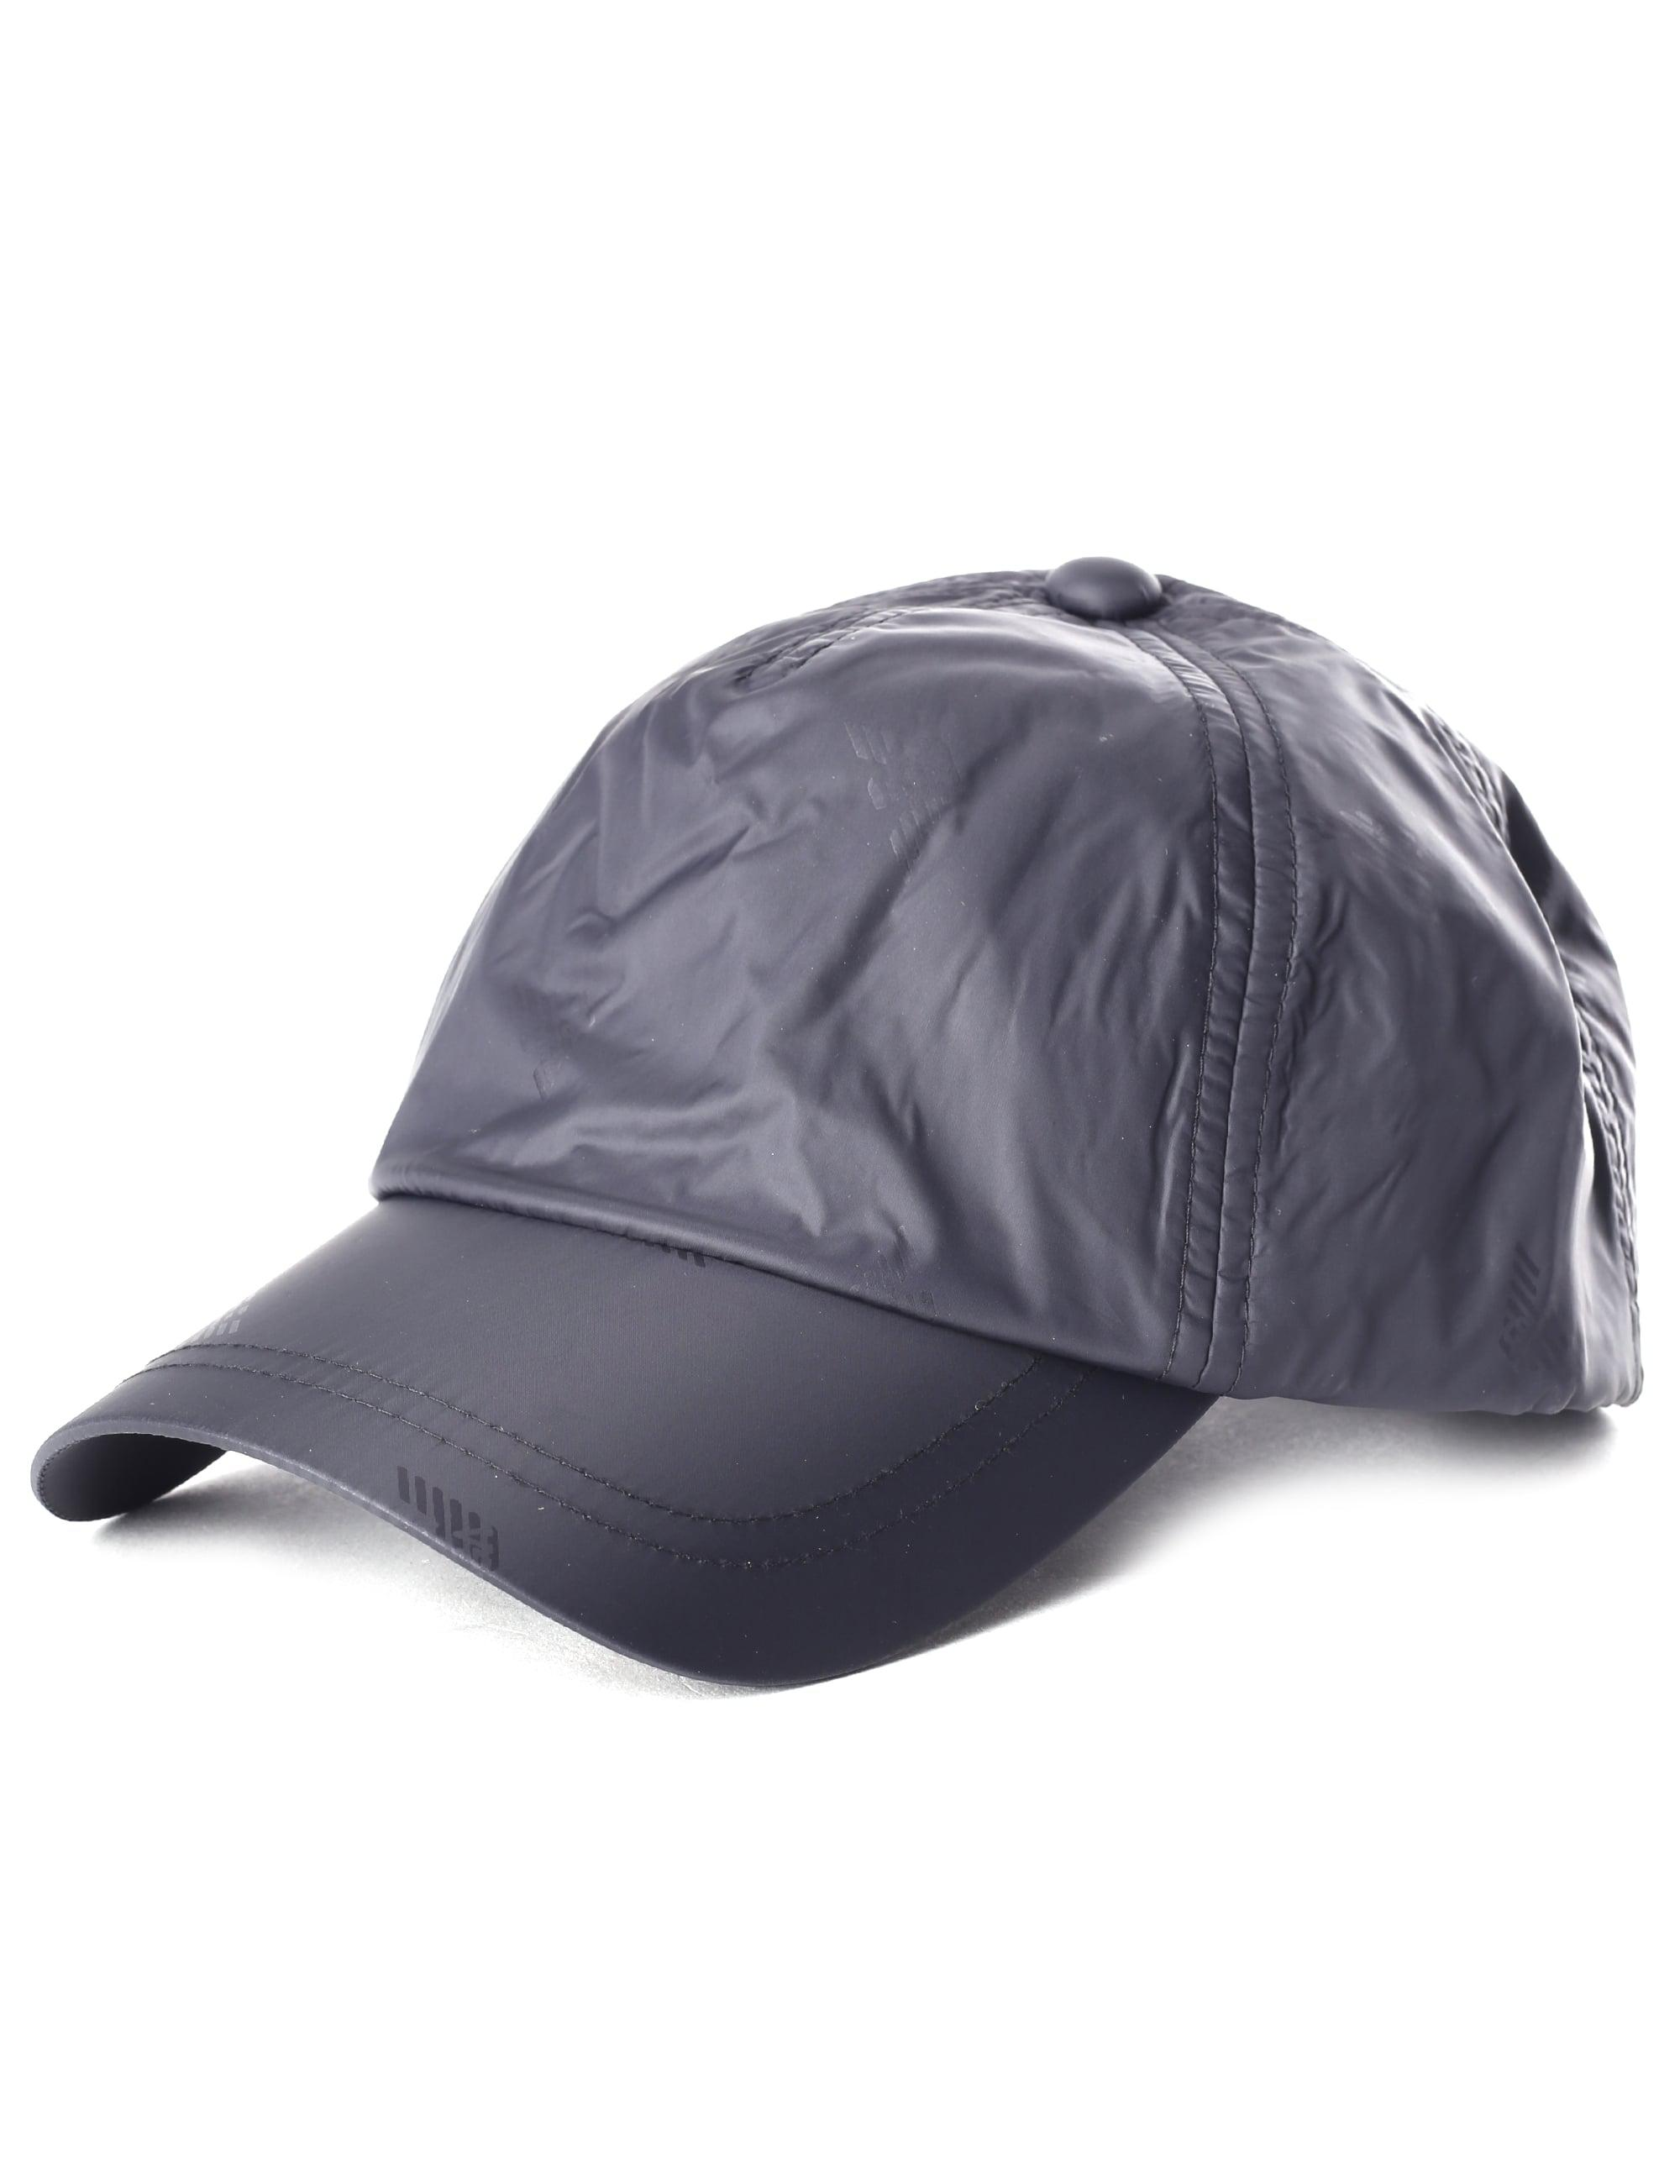 9a31c671a28 Emporio Armani Men s Repeat Logo Baseball Cap Black in Black for Men - Lyst